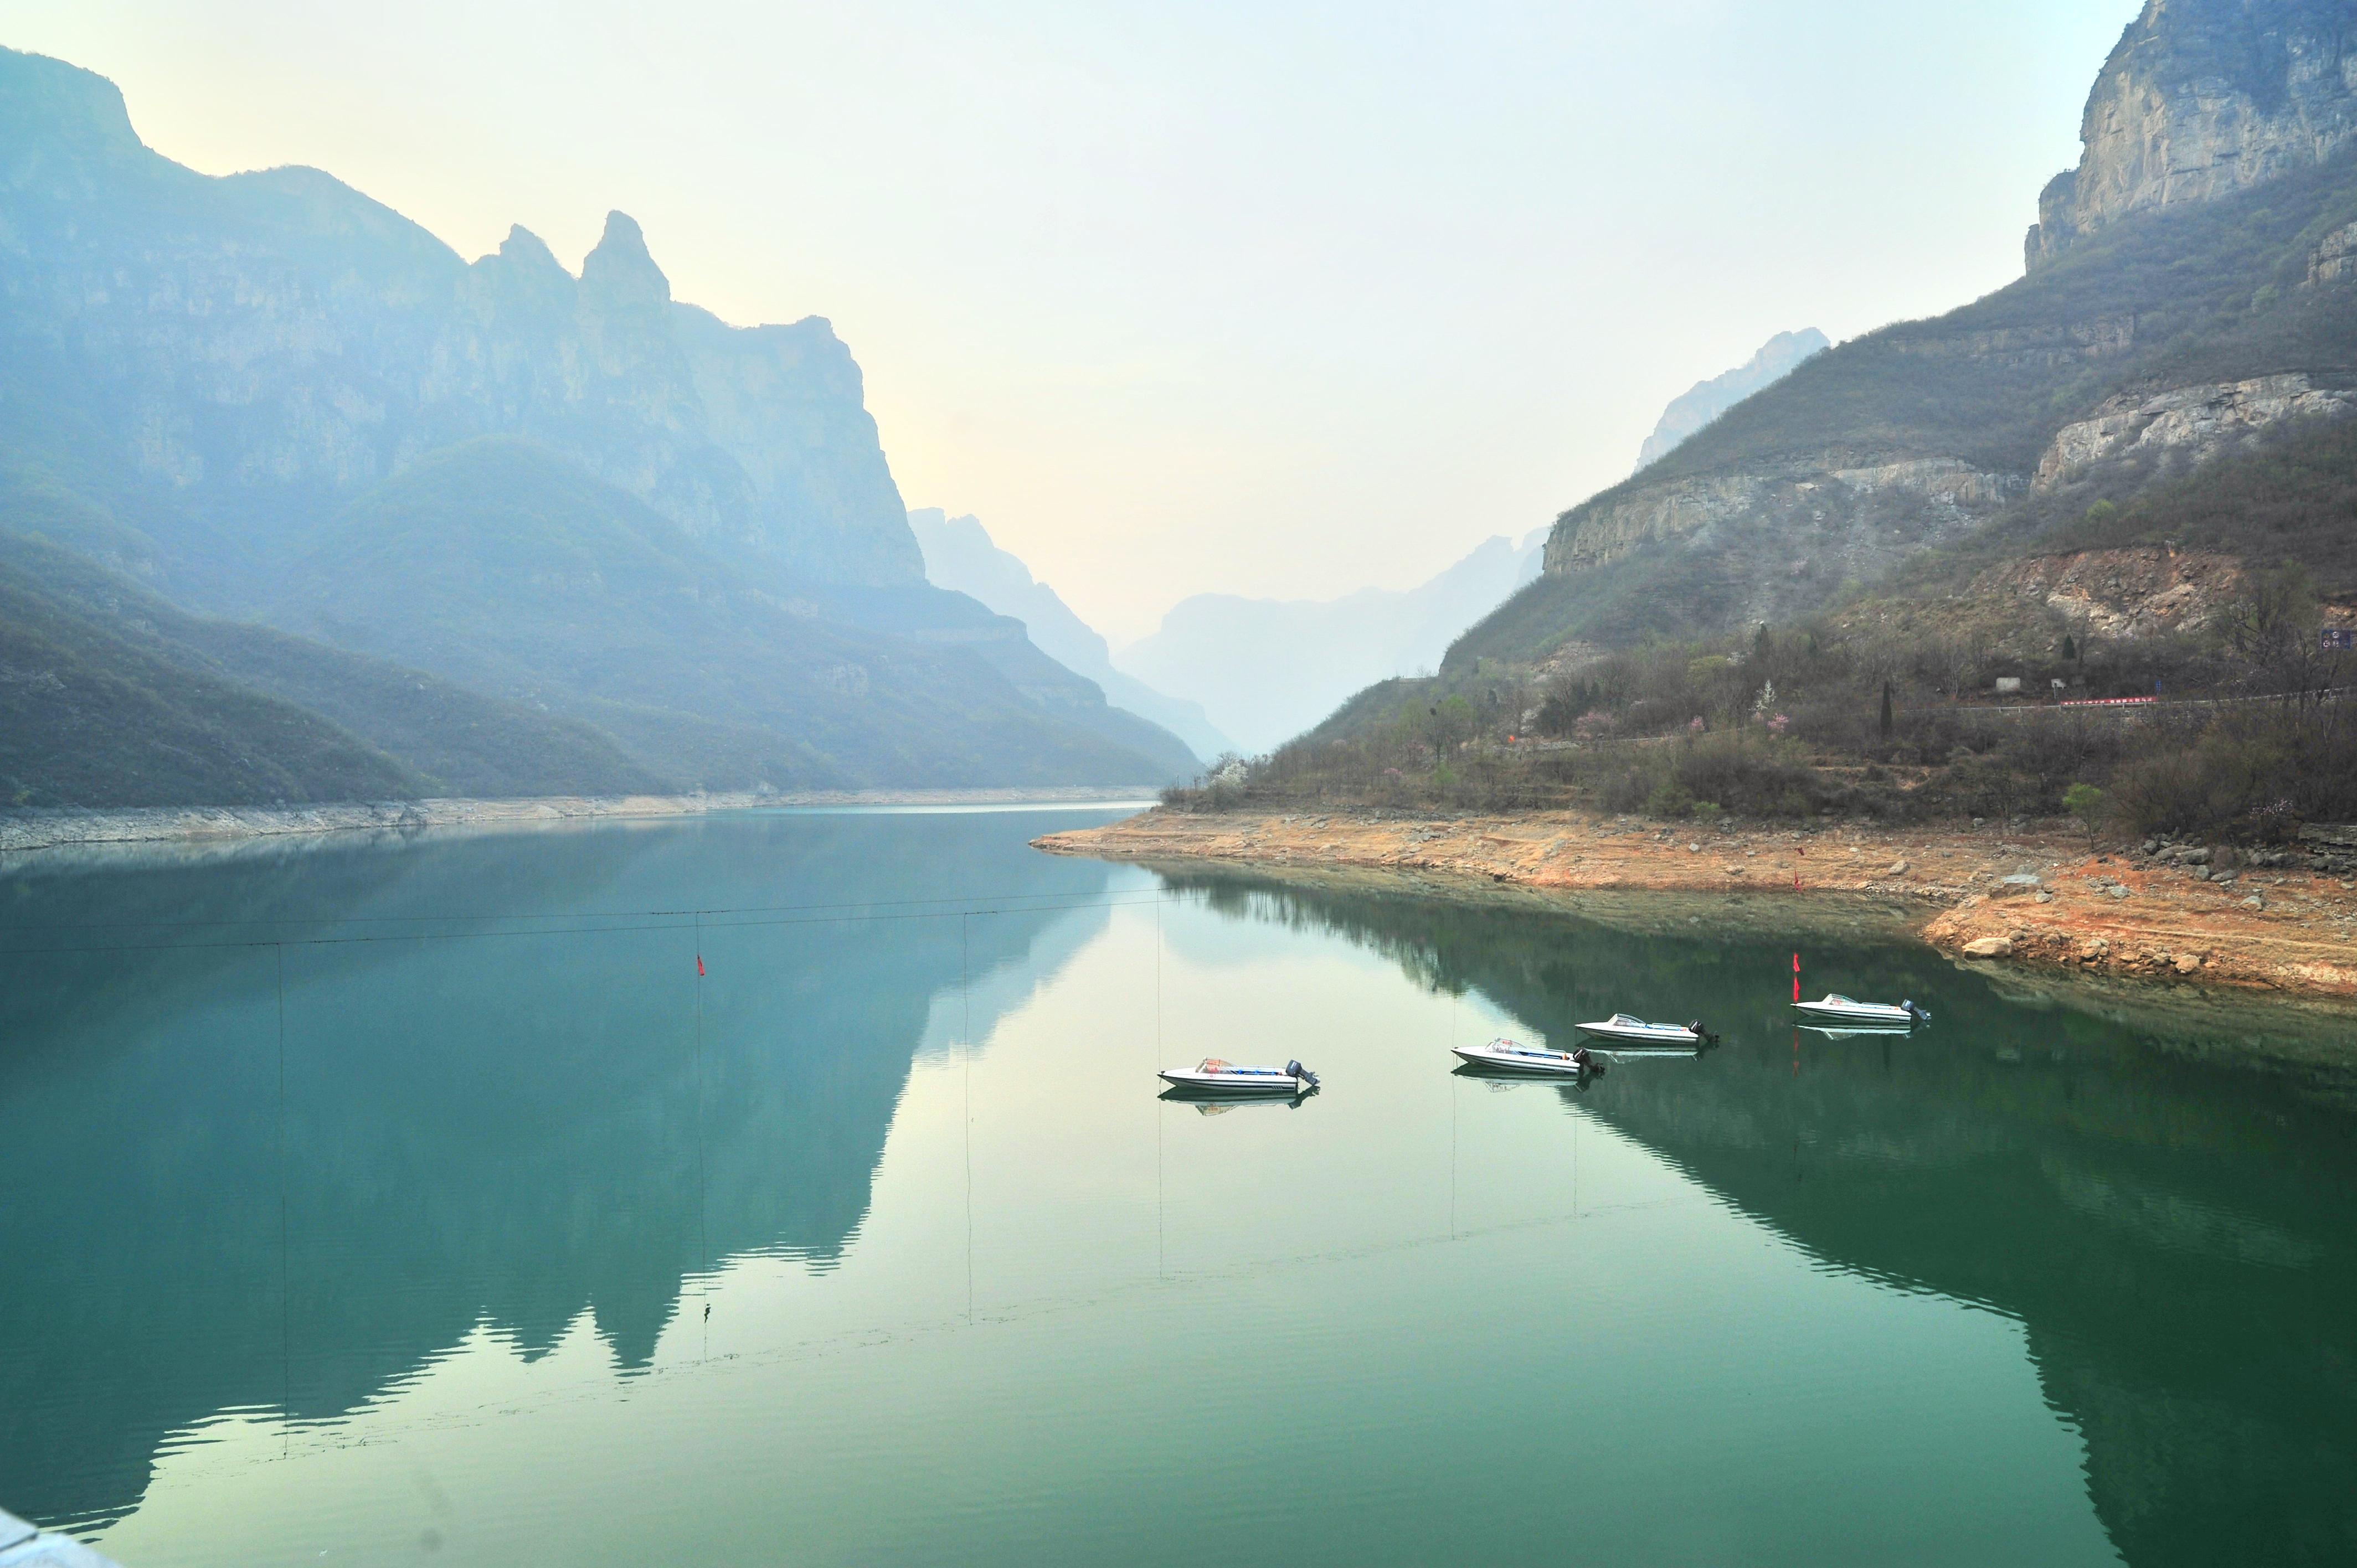 Ovary Lake